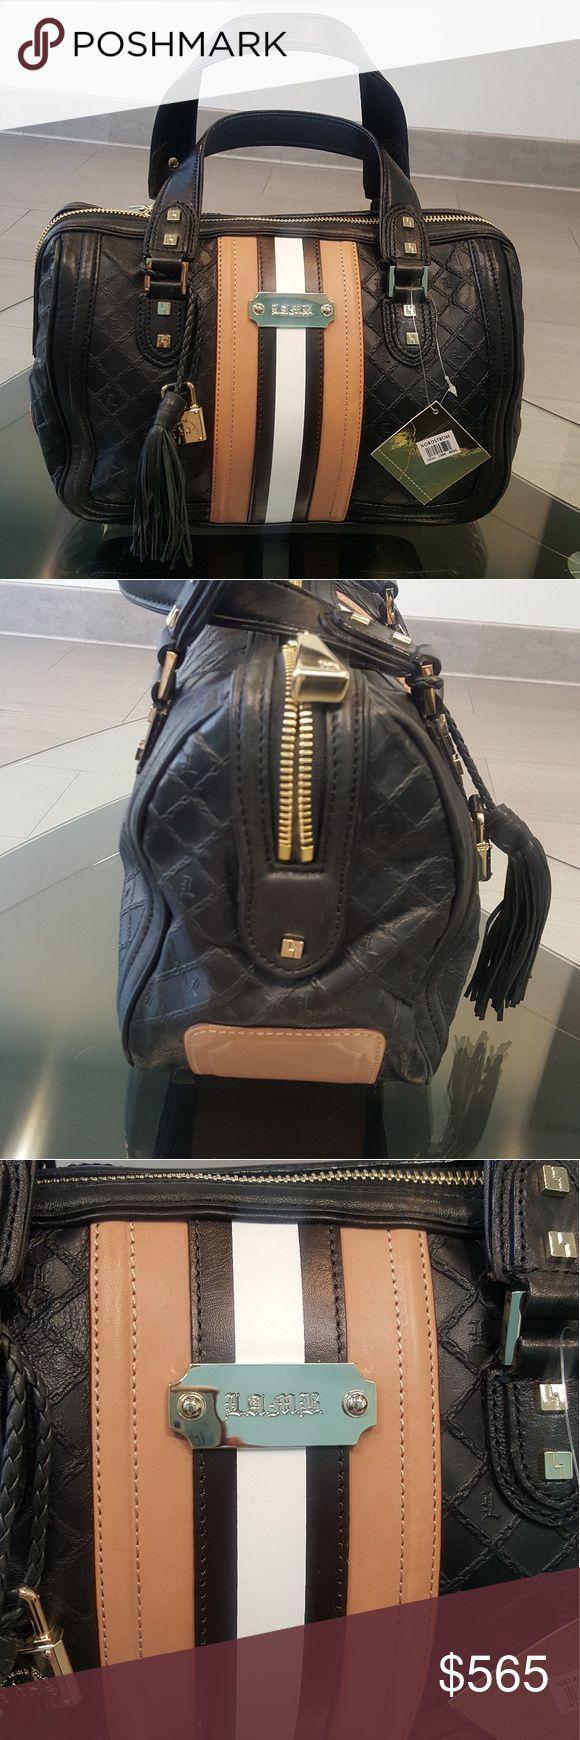 "LAMB purse Stylish leather LAMB bag 14x6x10"" brand new LAMB Bags Satchels"